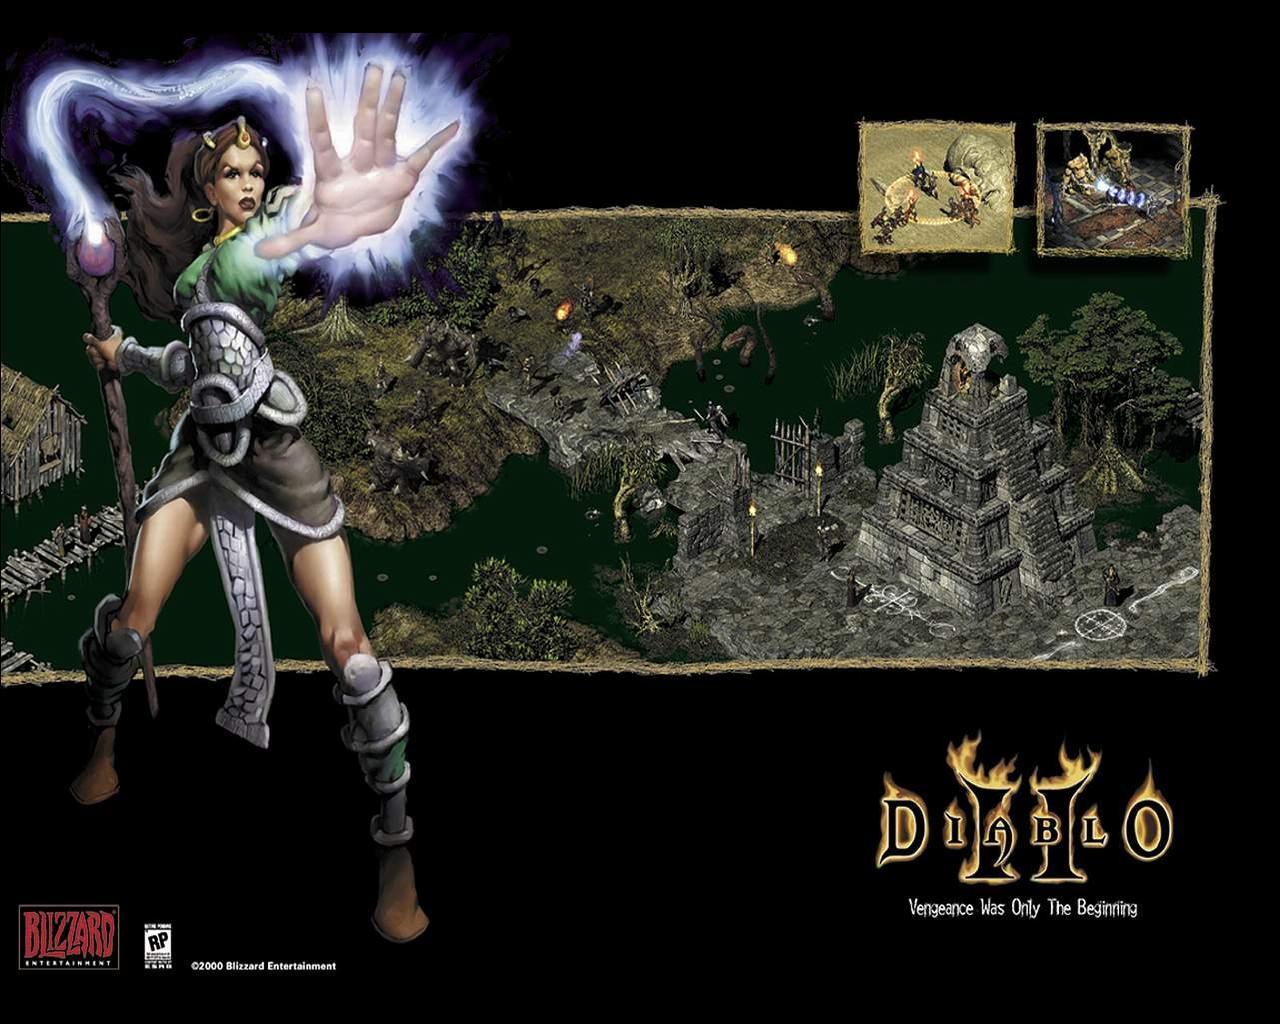 Wallpapers Diablo Diablo 2 Games Diablo II